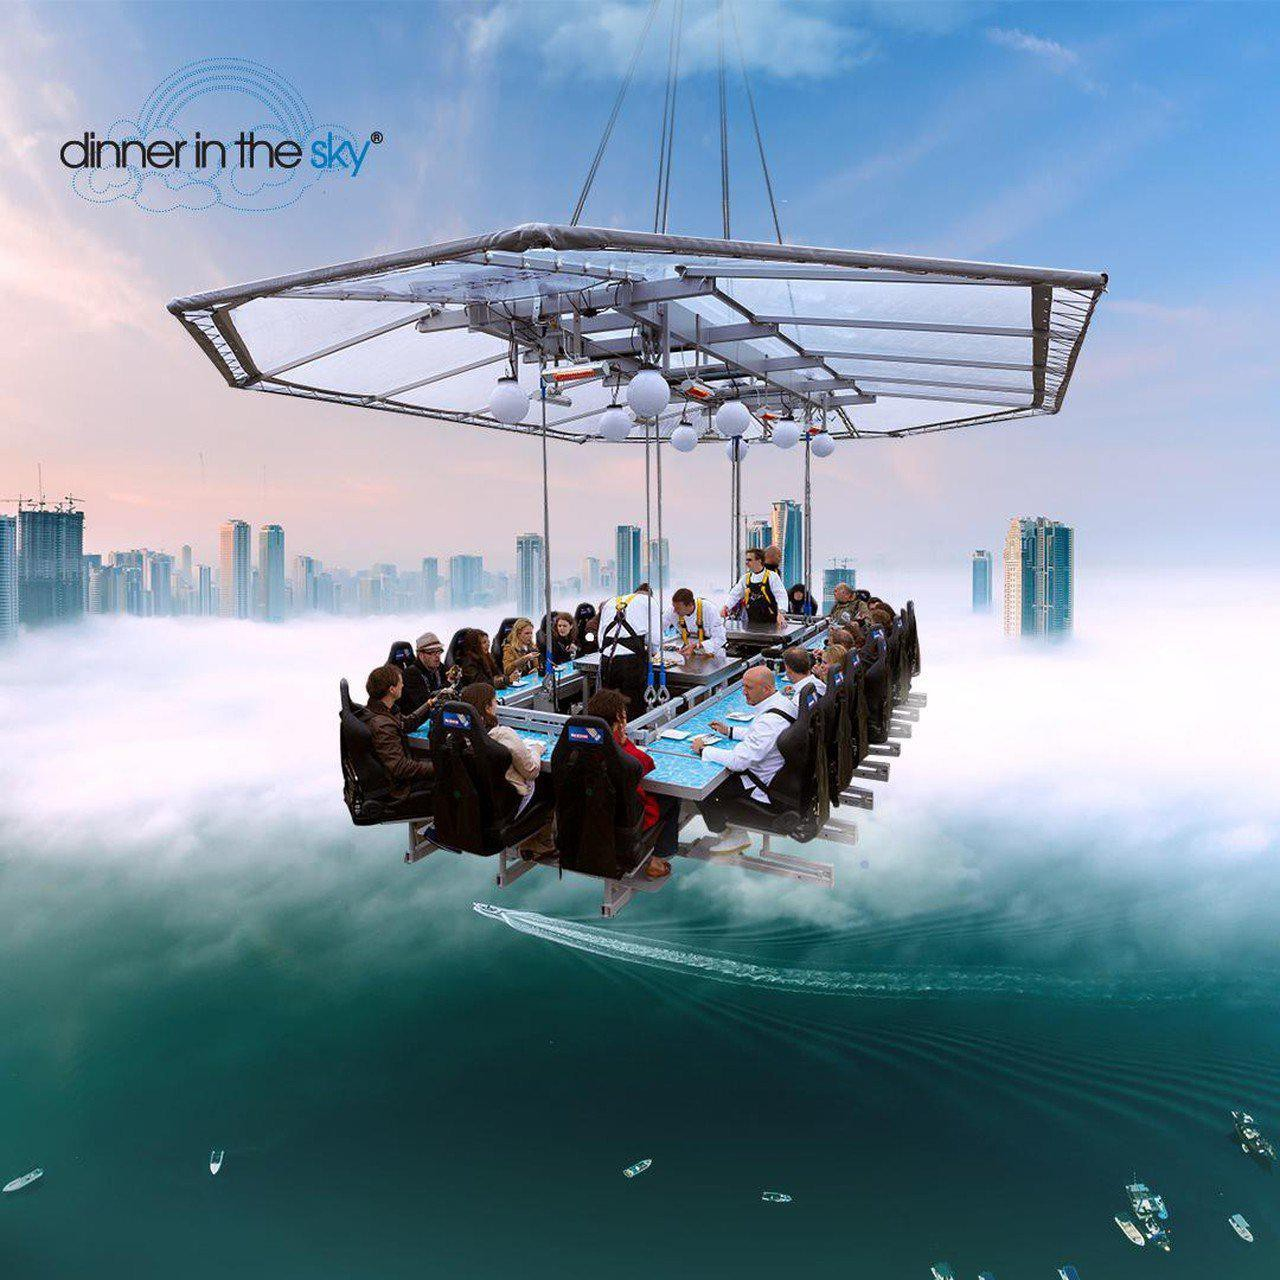 Nuremberg corporate event venues Lieu Atypique Dinner in the sky image 0